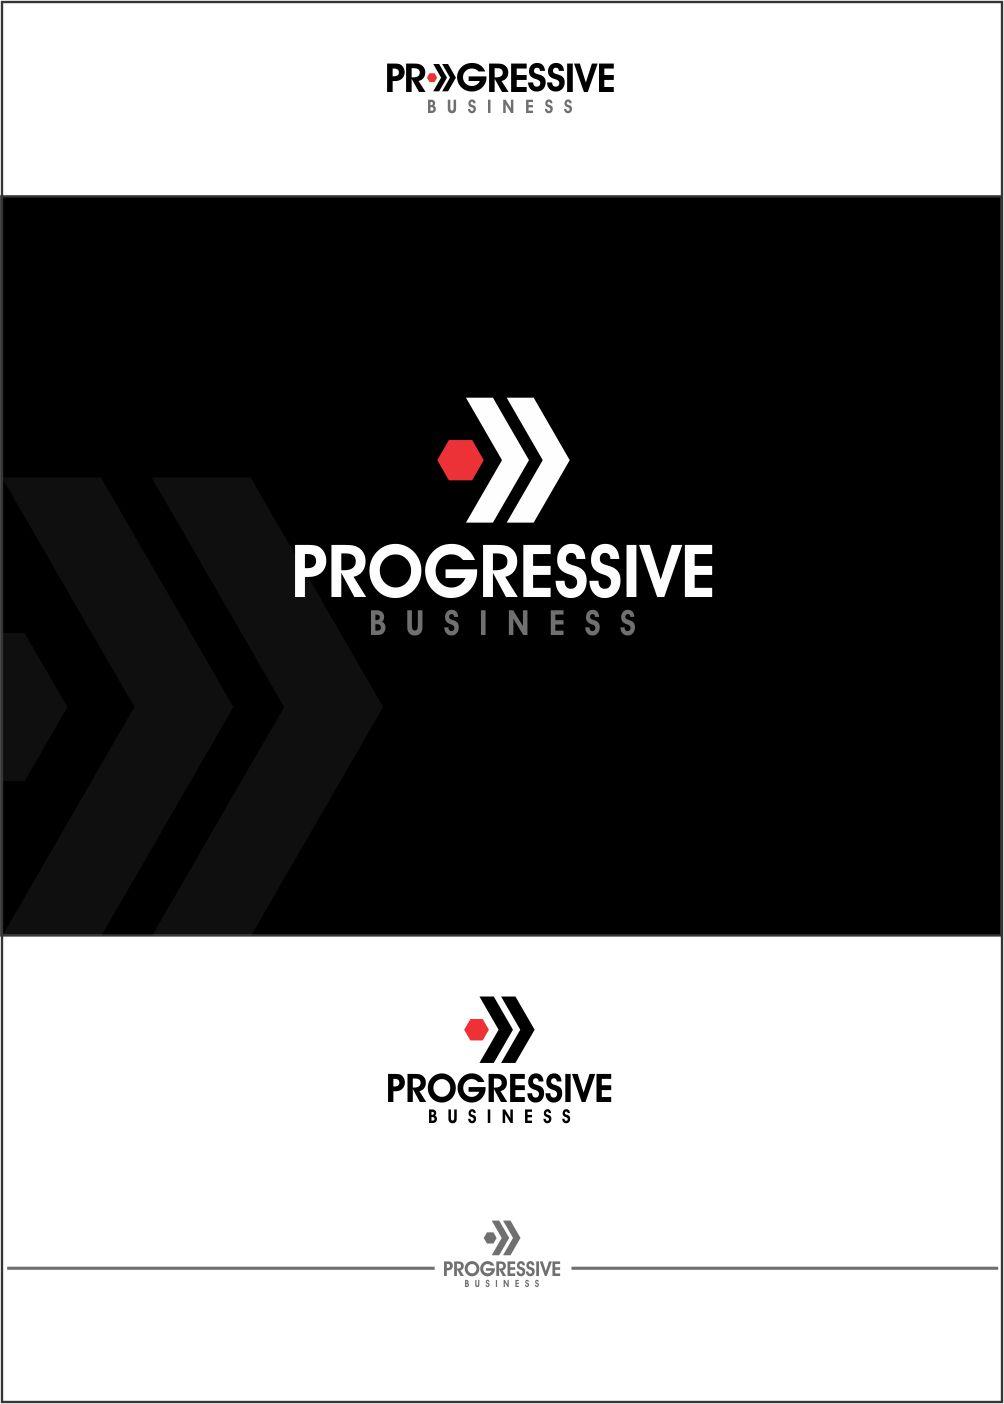 Logo Design by ian69 - Entry No. 14 in the Logo Design Contest Captivating Logo Design for Progressive Business.